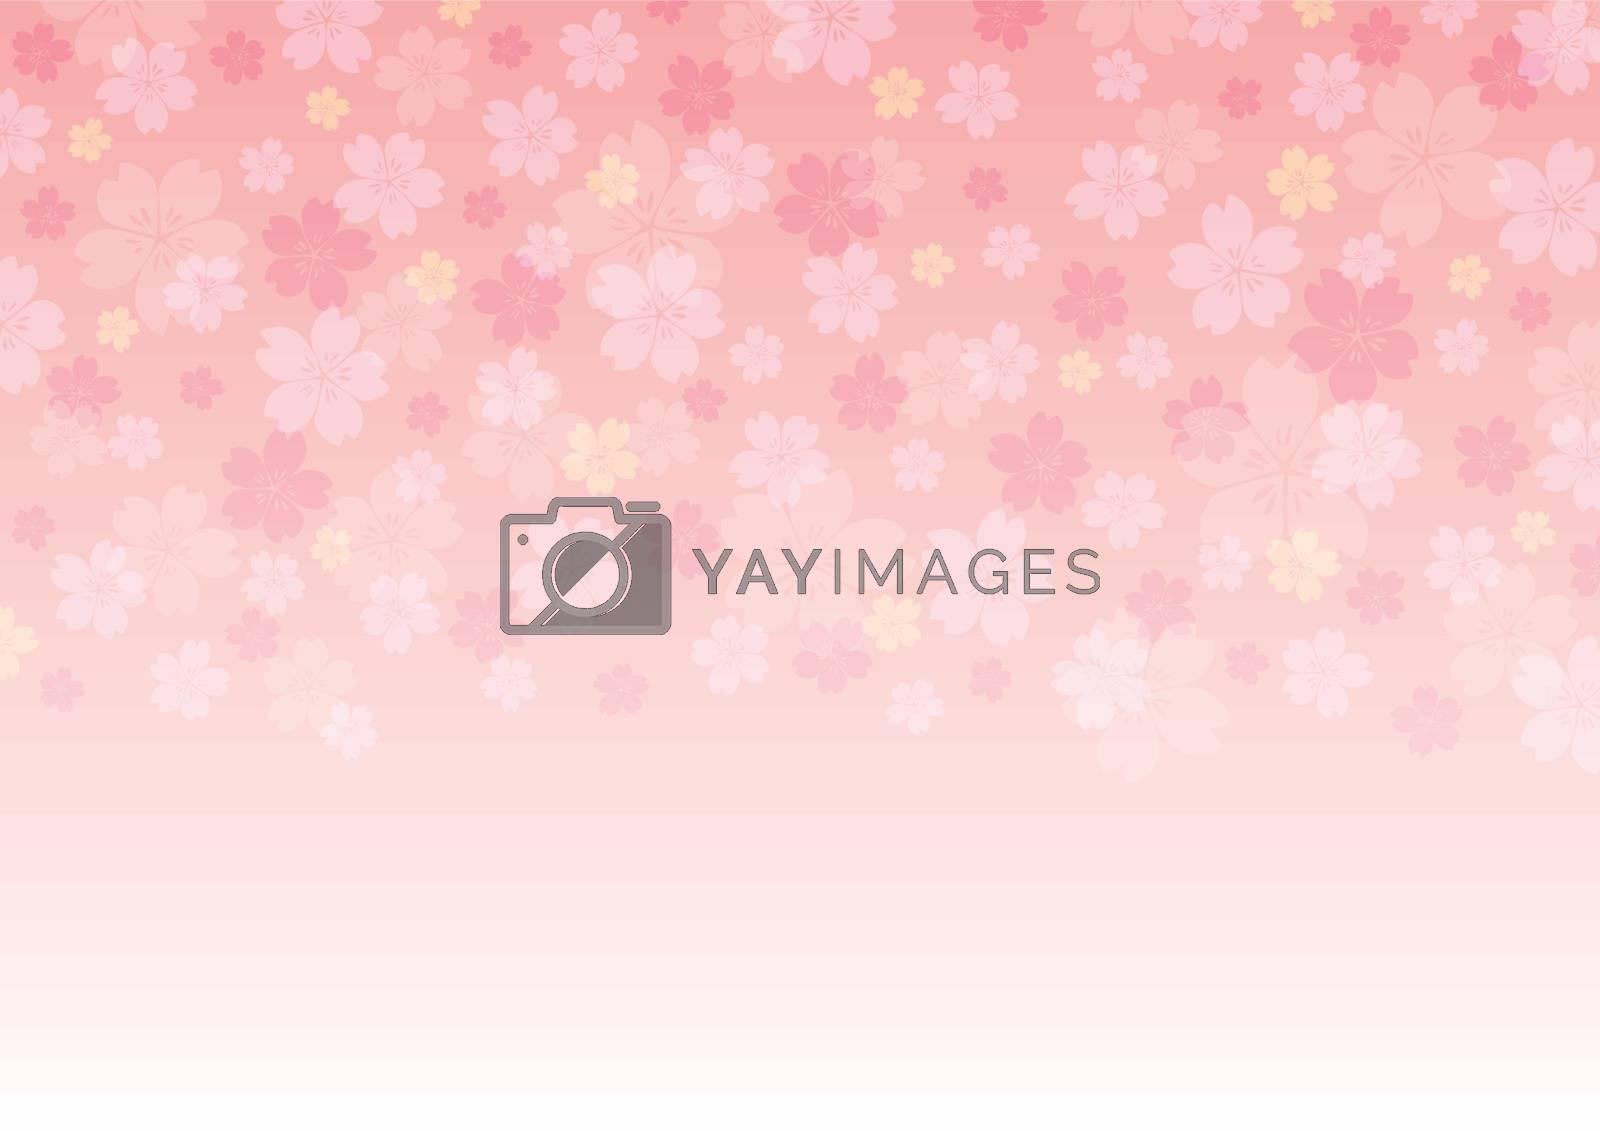 Cherry blossoms background illustration. Spring season banner.